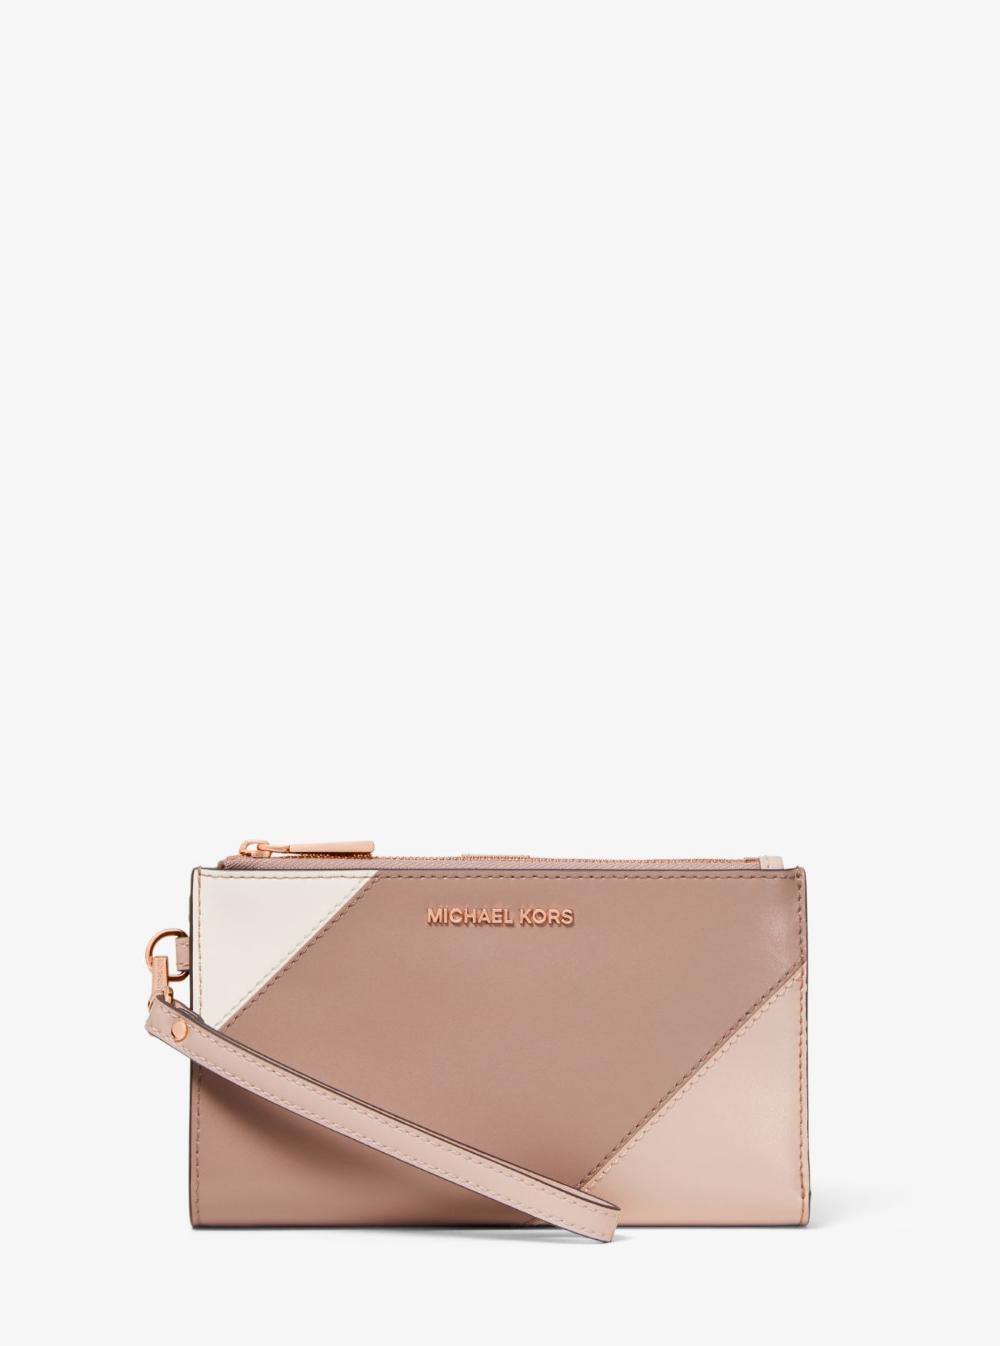 Adele Tri Color Leather Smartphone Wallet Michael Kors Smartphone Wallet Michael Kors Wallet Leather